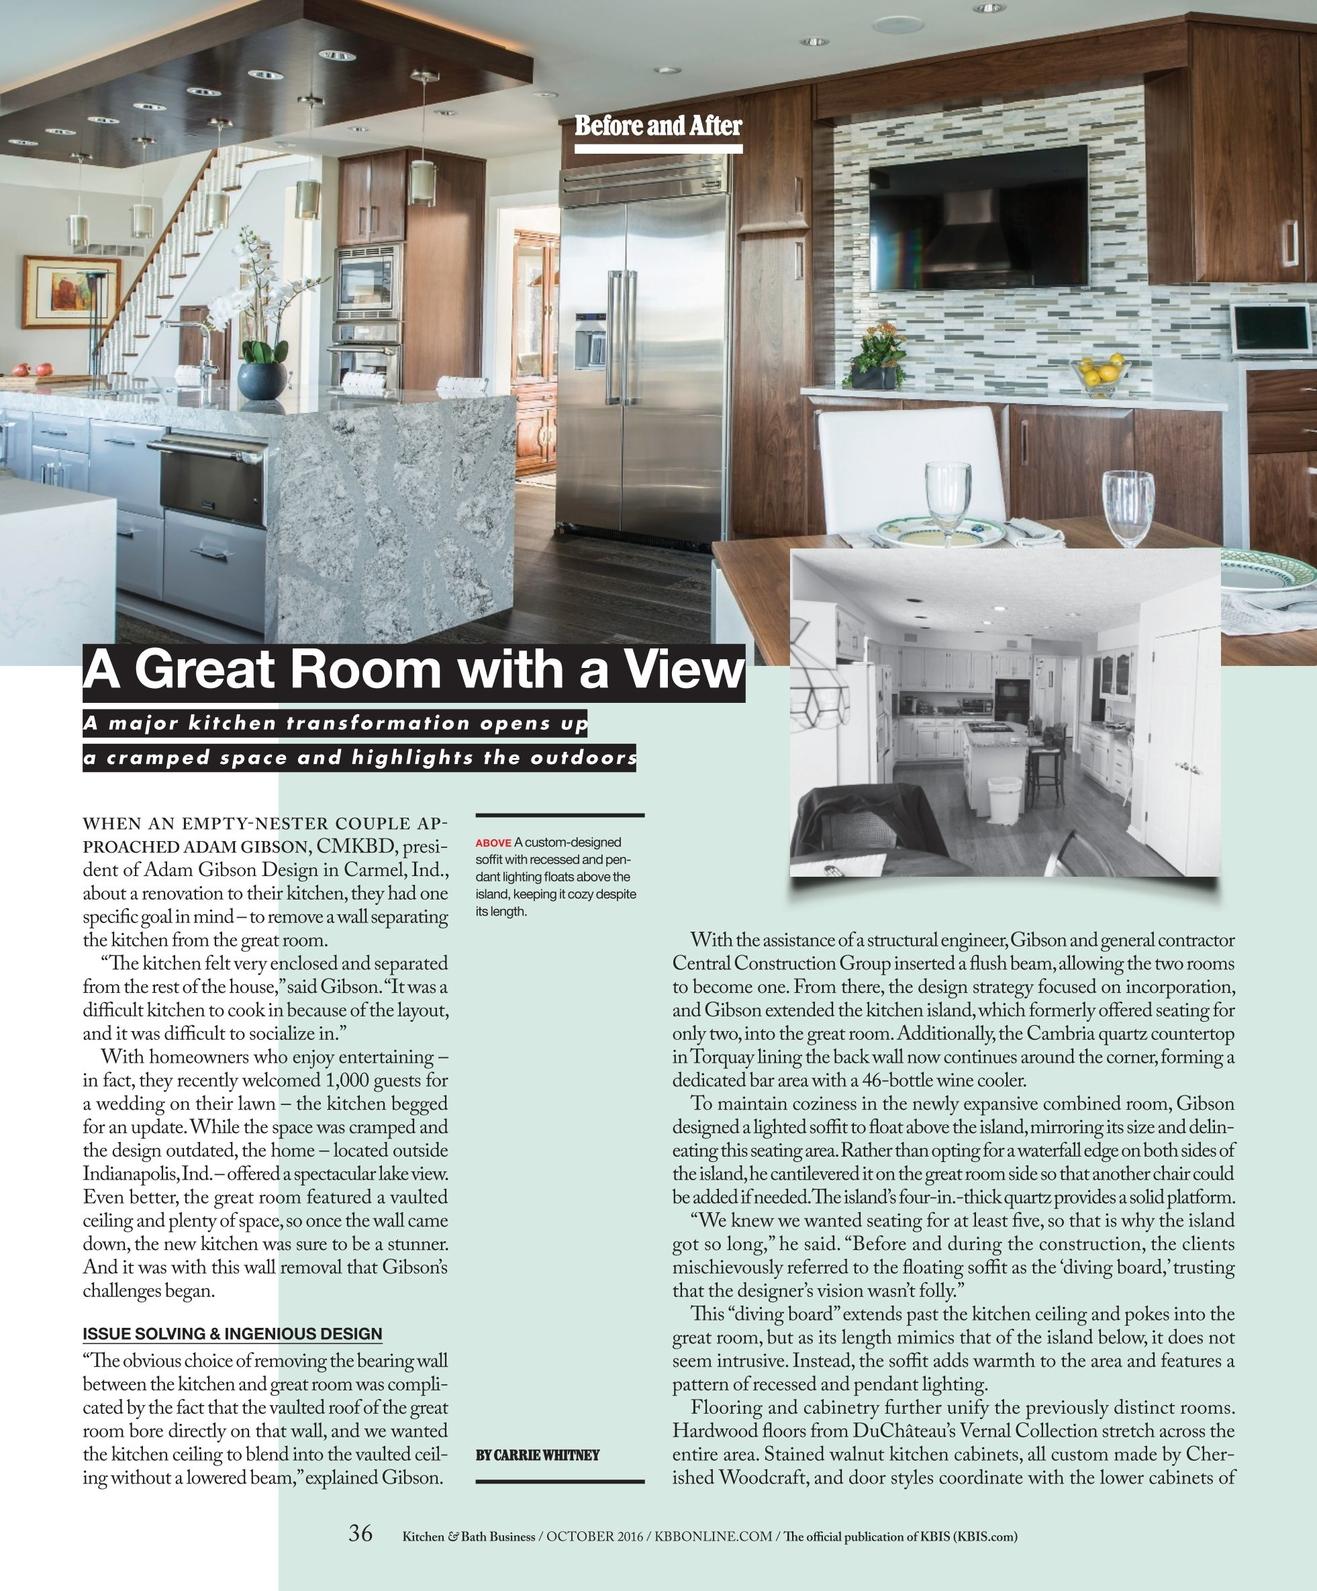 Kitchen & Bath Business - October 2016 [36 - 37]